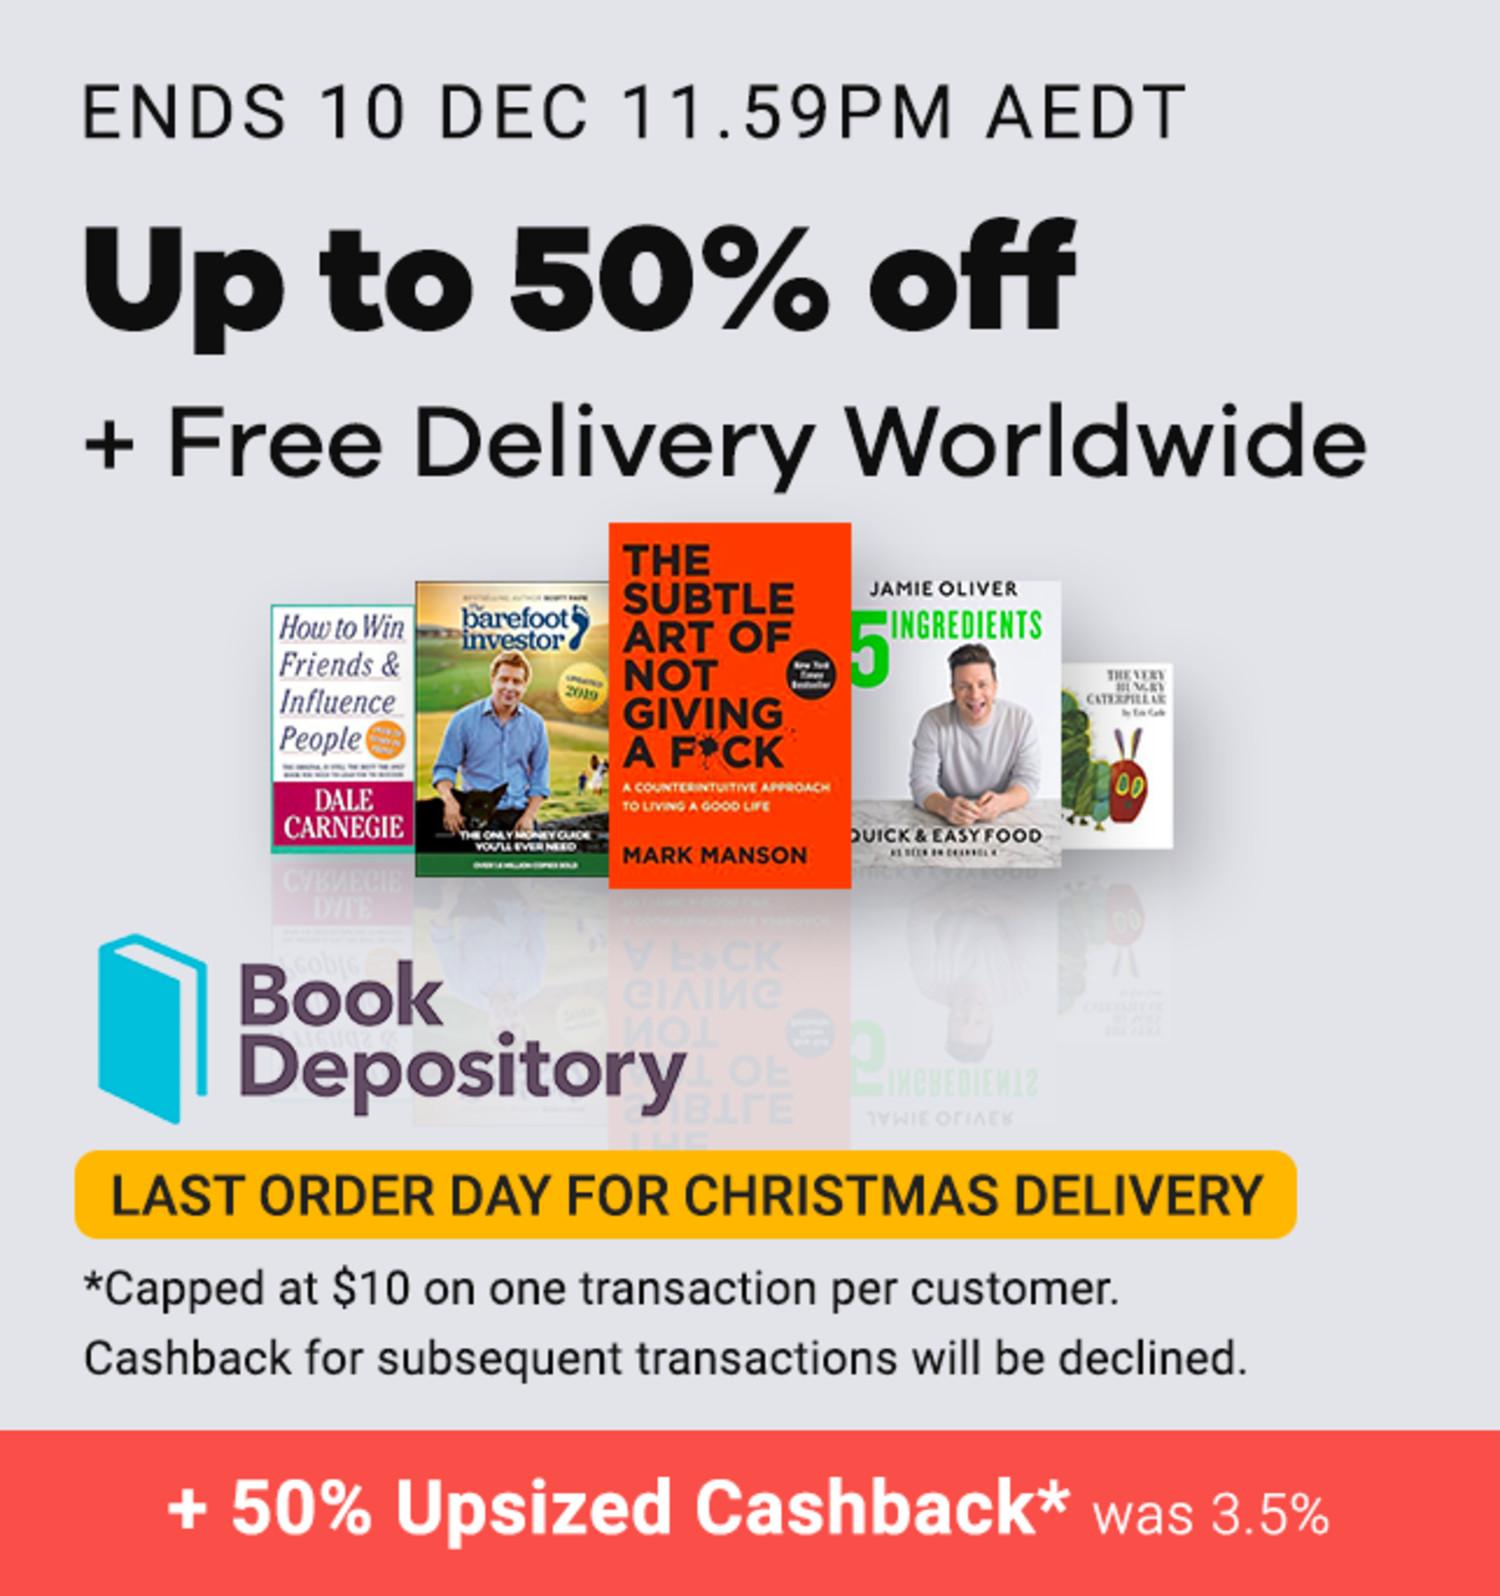 Book Depository - 50% Cashback